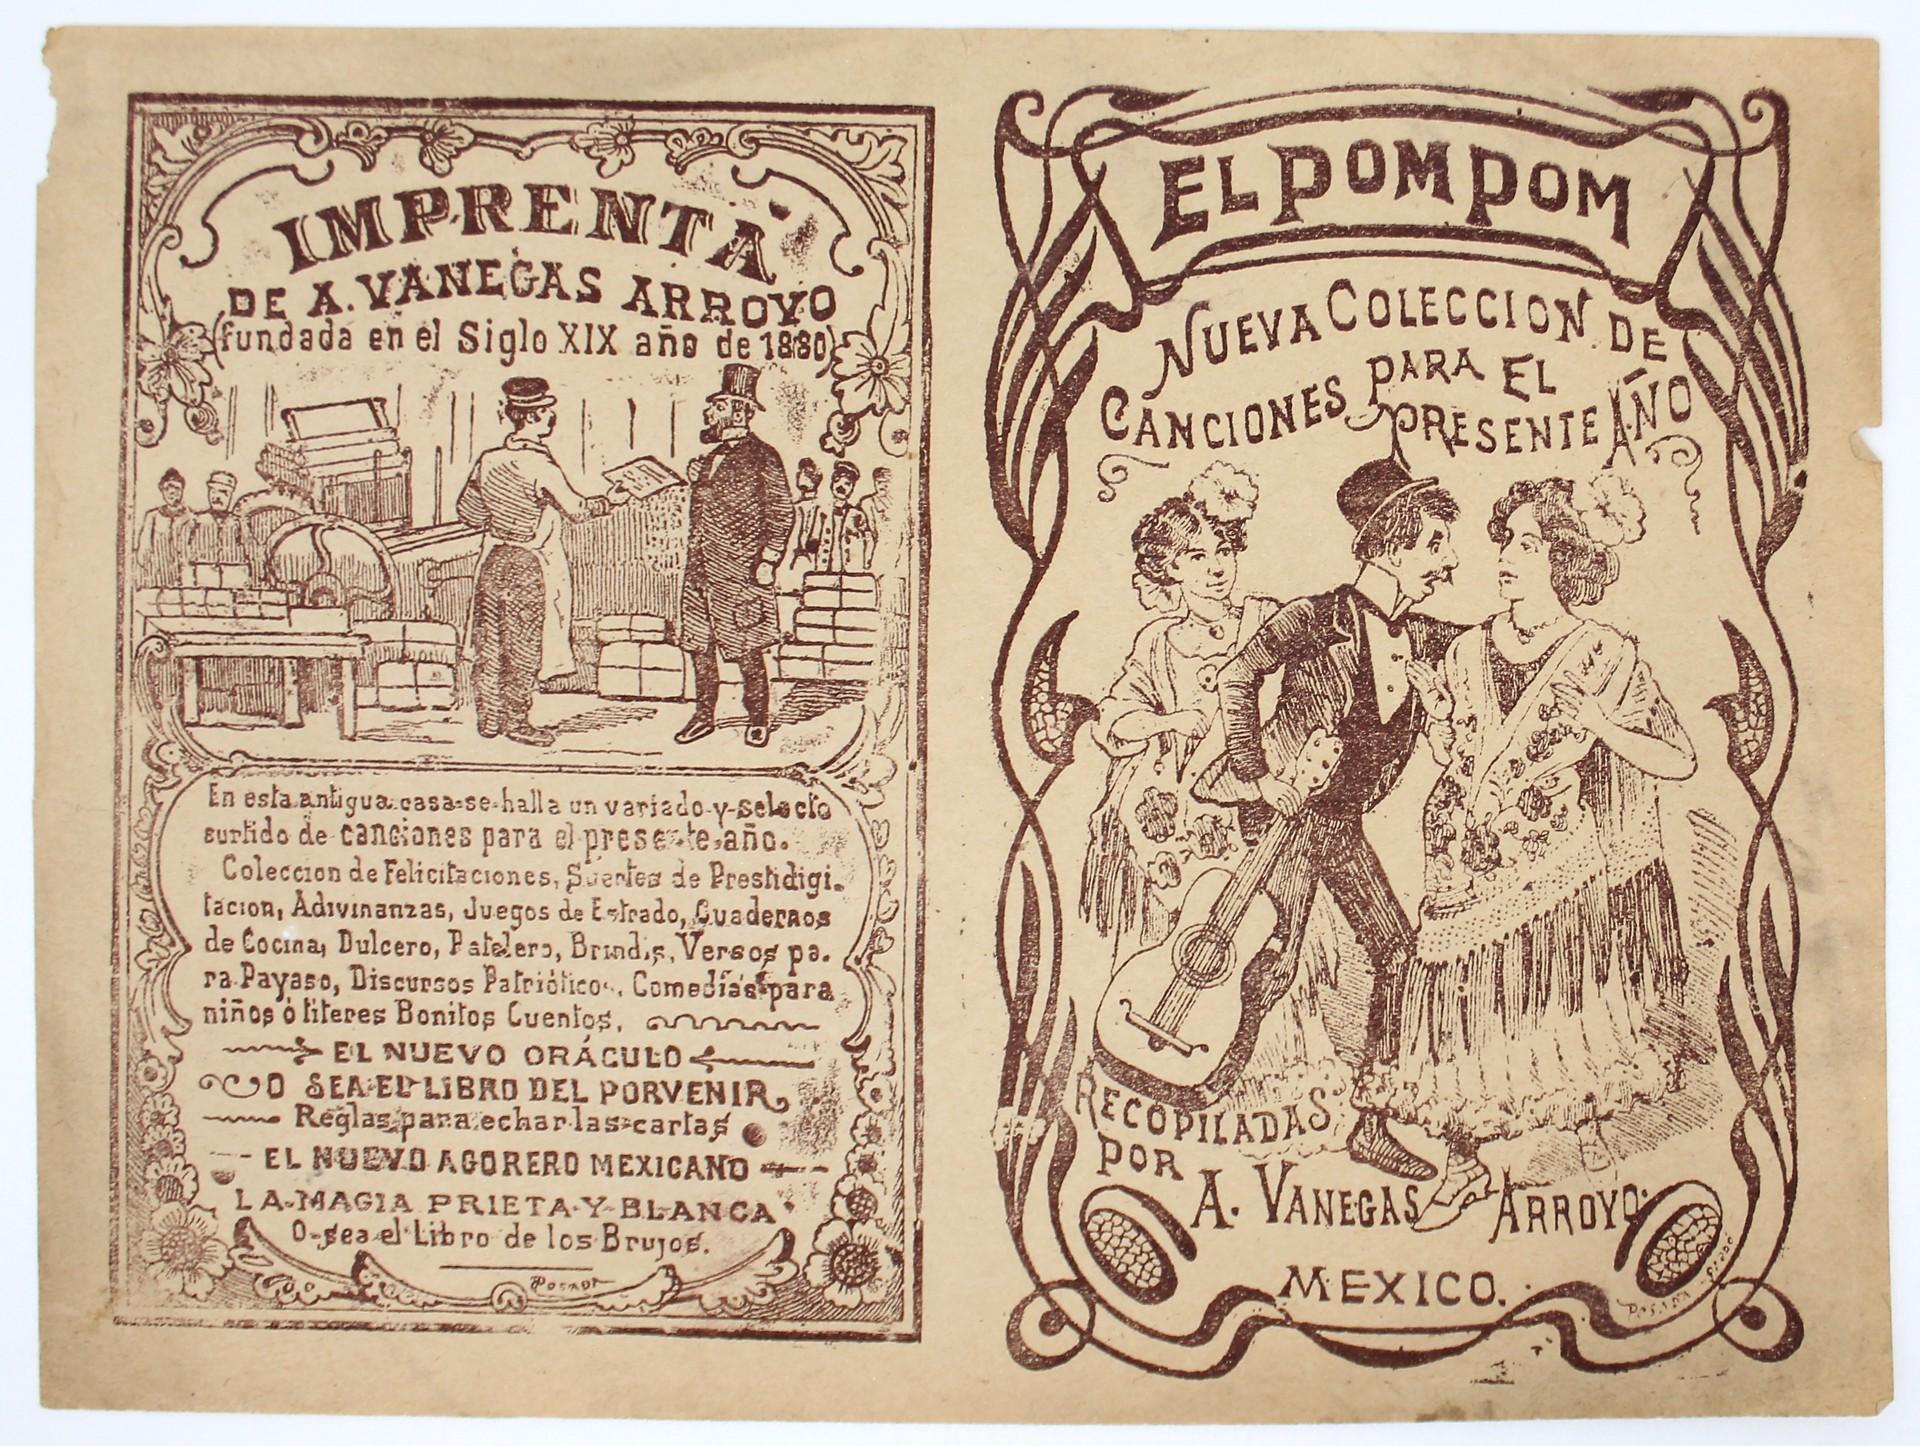 El Pom Pom (2nd Impression) by José Guadalupe Posada (1852 - 1913)